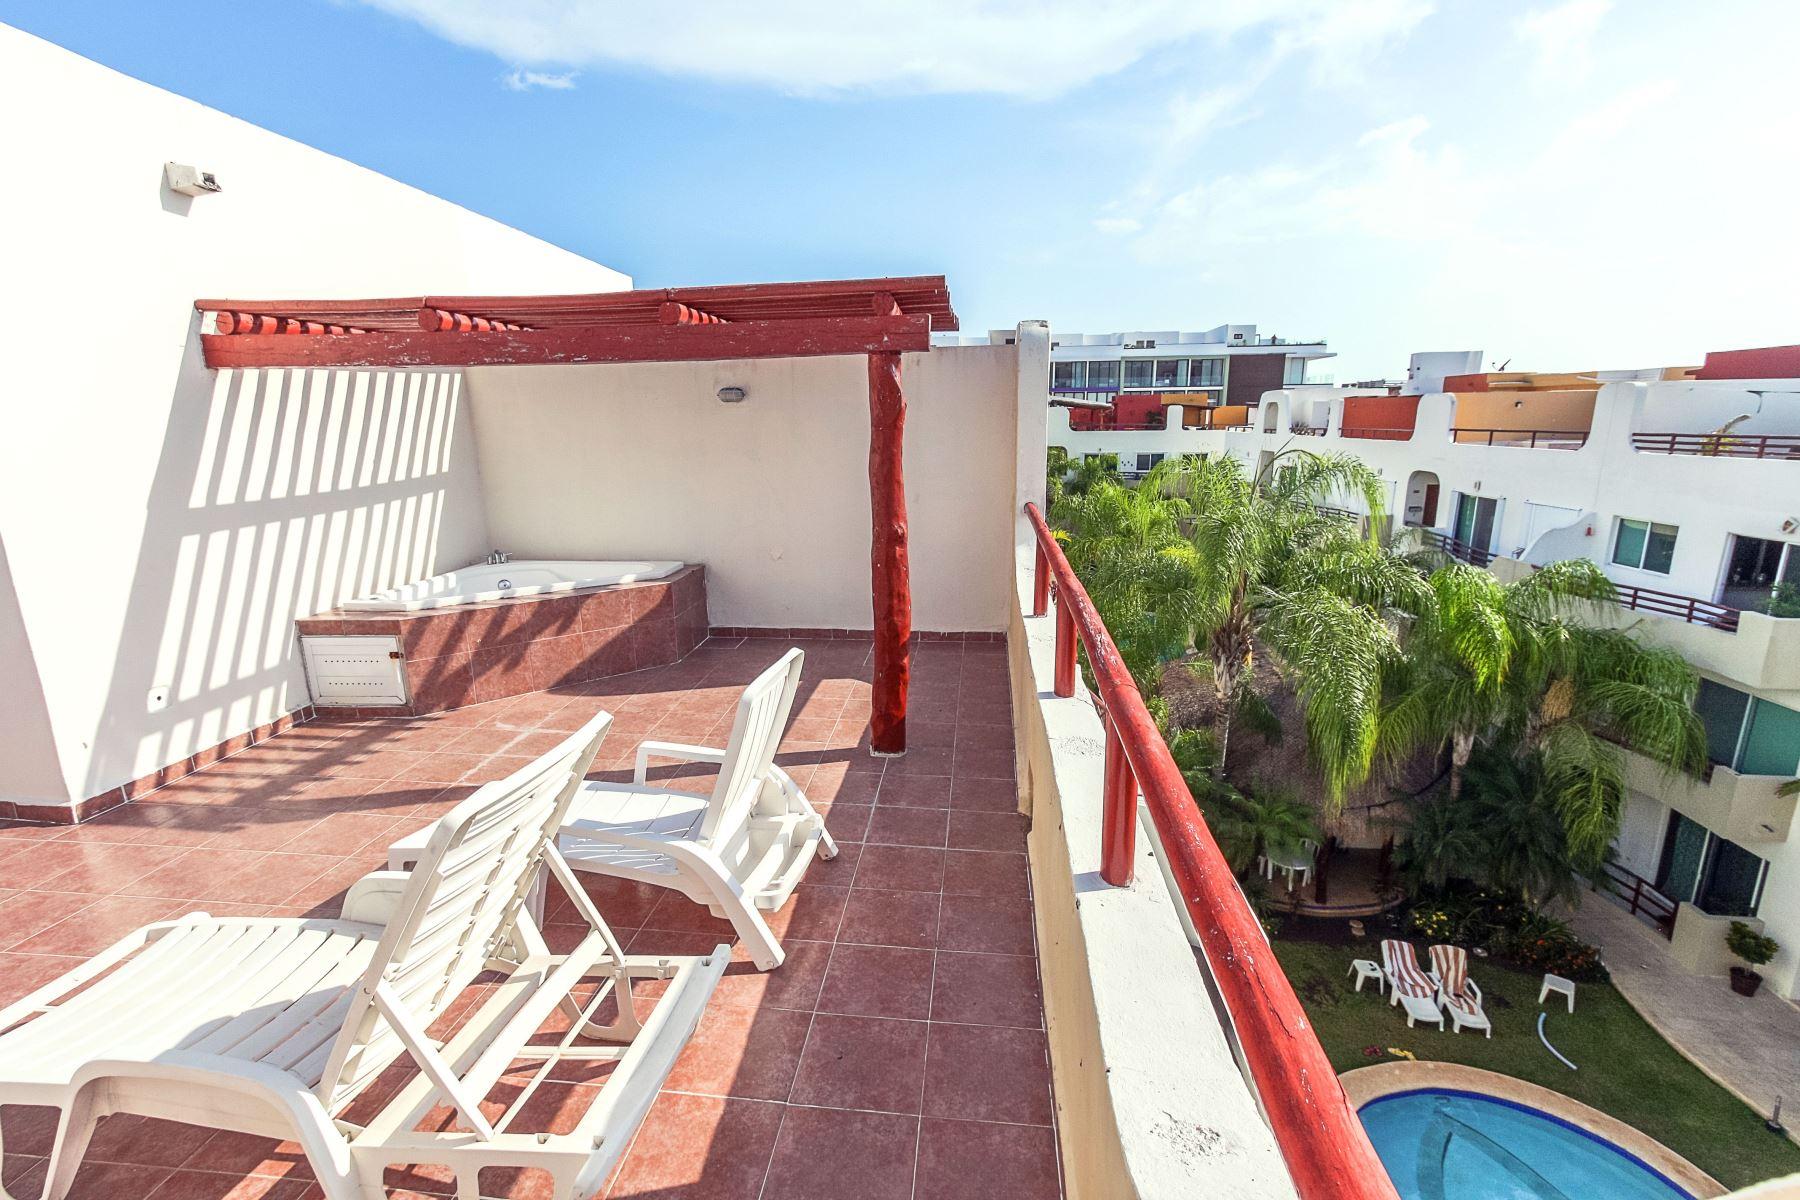 Margaritas 2 Playa del Carmen Penthouse Home For Sale Real Estate to Buy